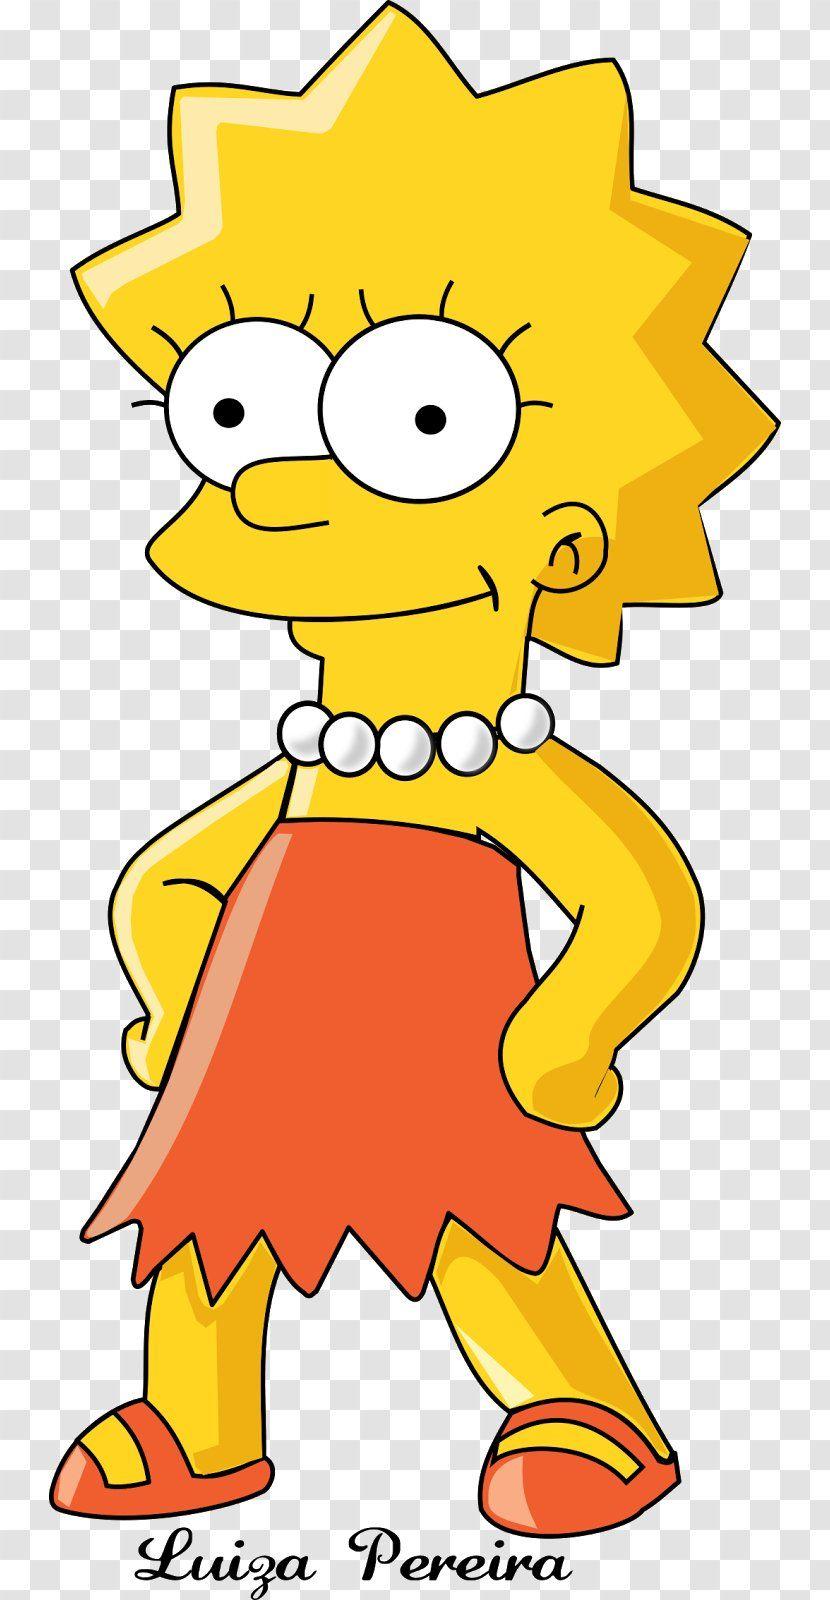 Lisa Simpson Bart Marge Maggie The Simpsons Tapped Out Marge Simpson Protagonist Simpsons Tapped Out Lisa Simps Lisa Simpson Marge Simpson Maggie Simpson